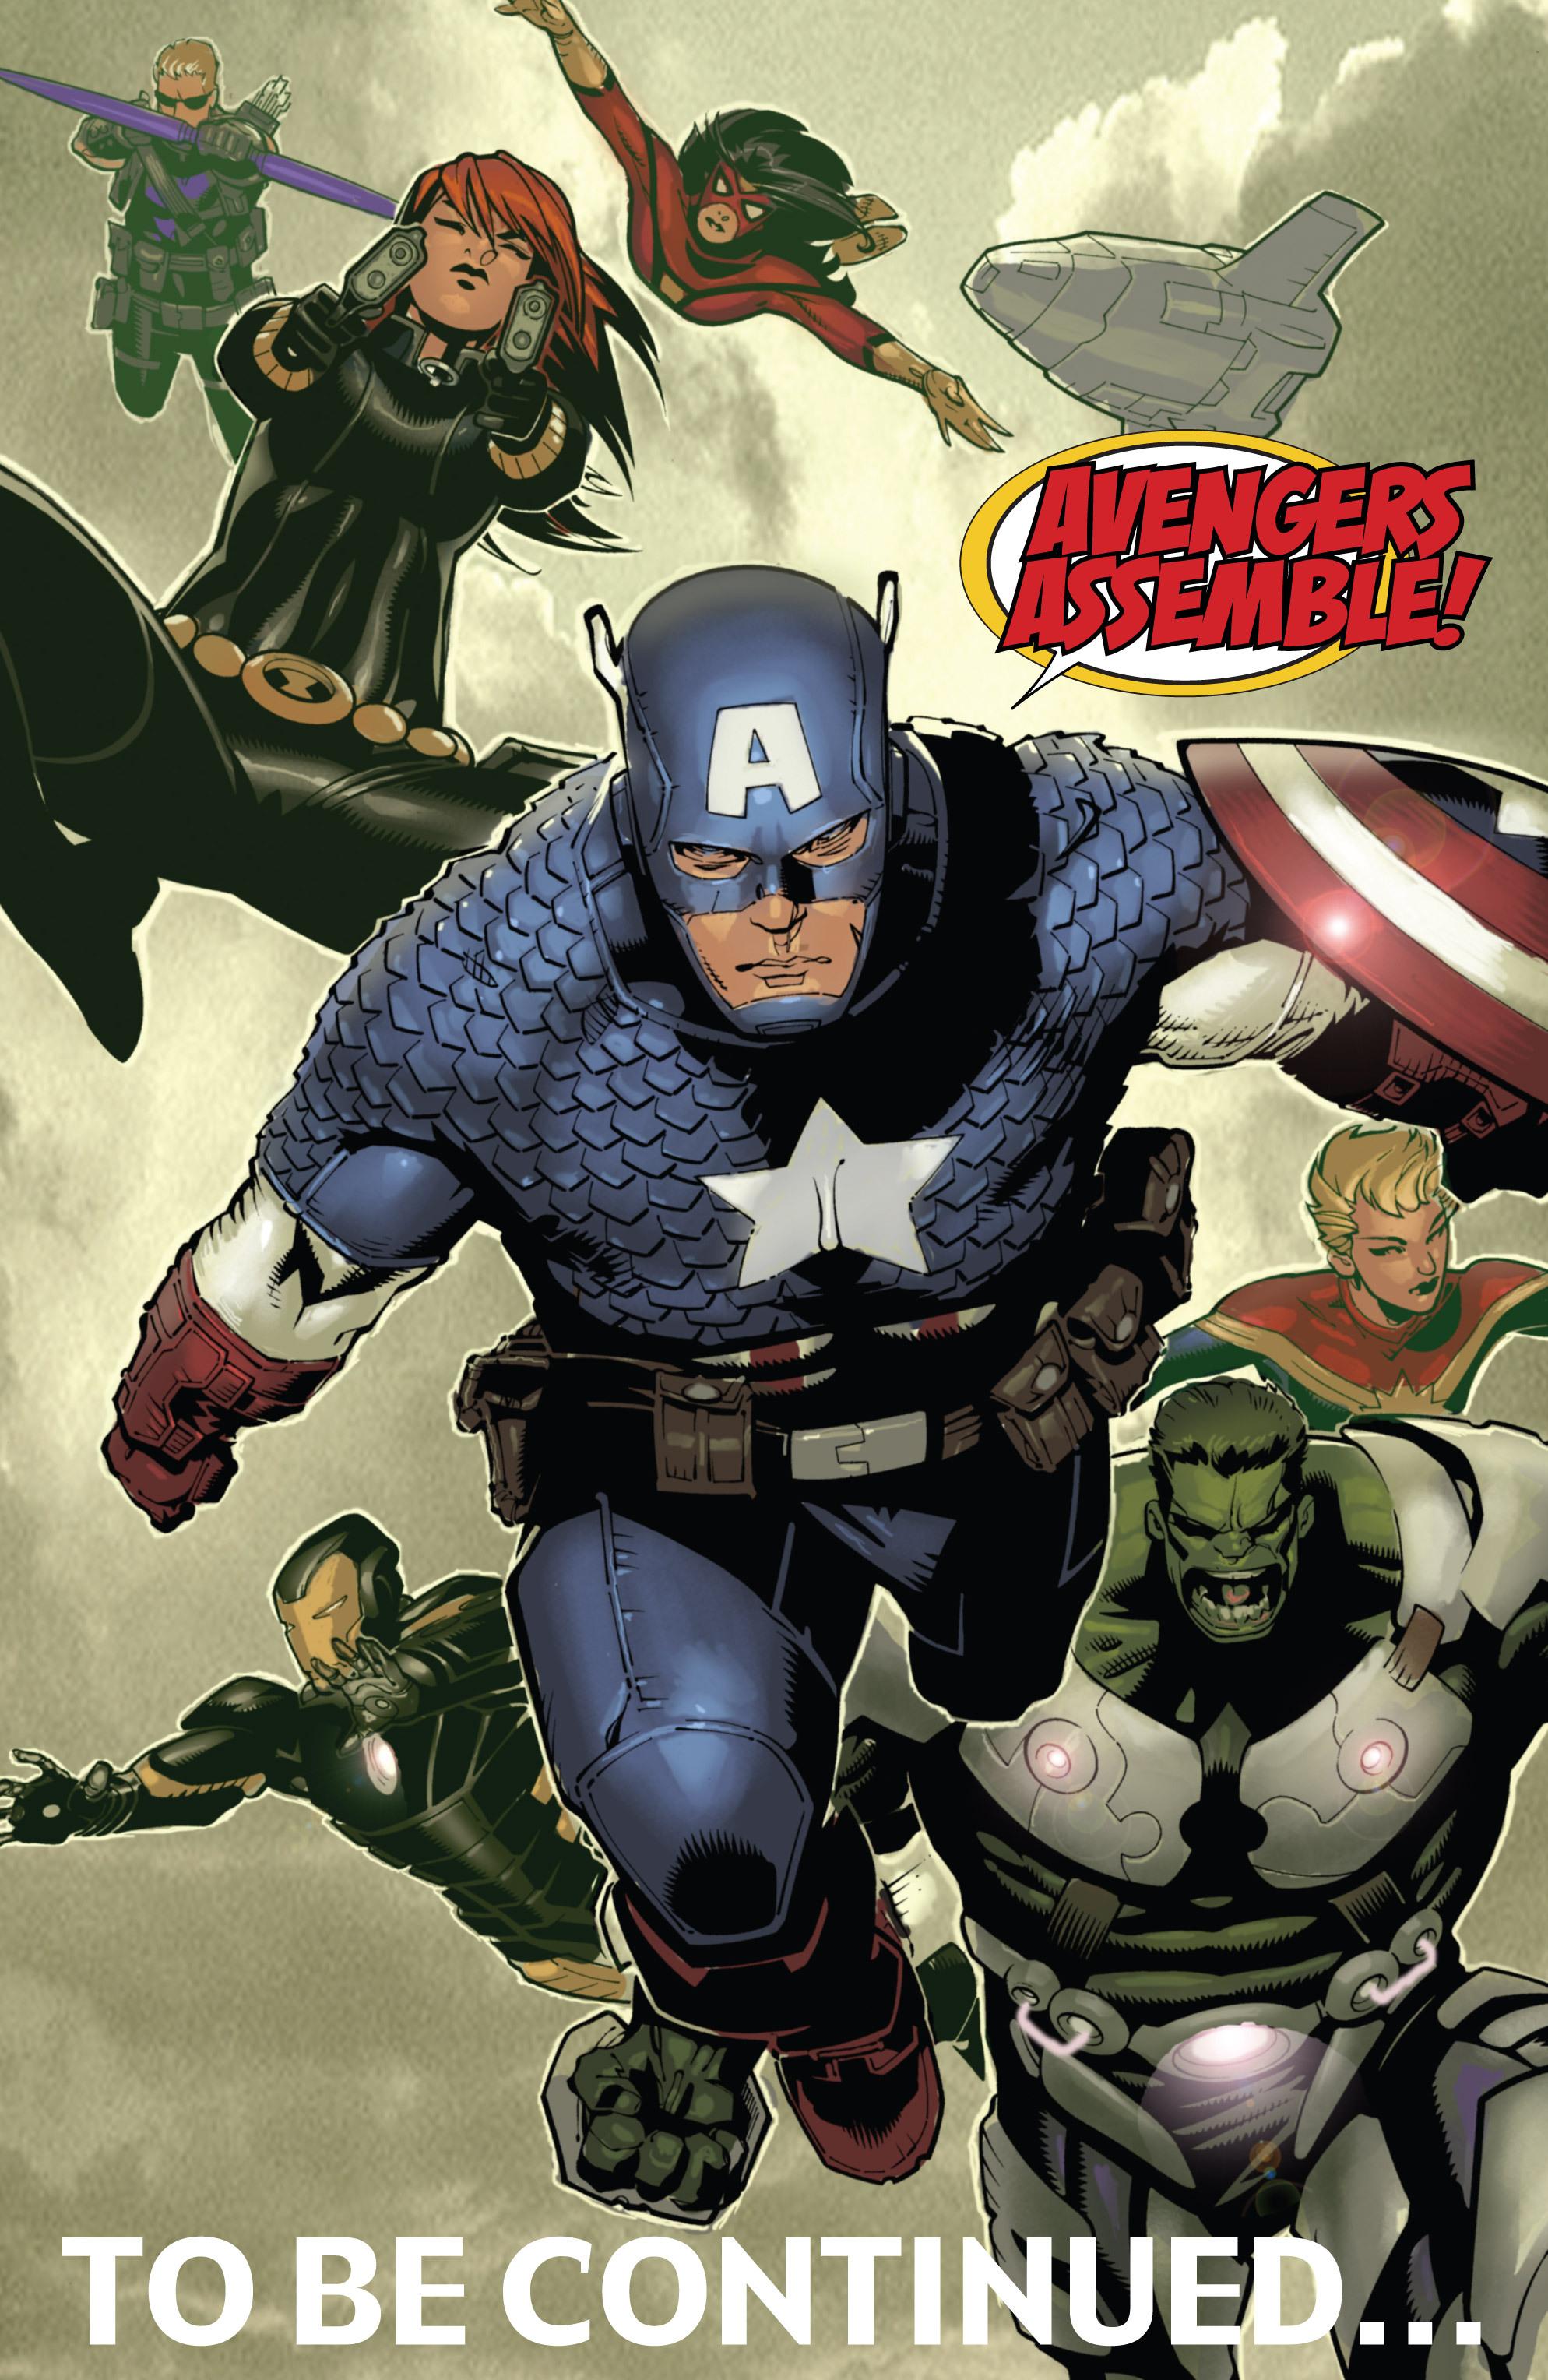 Read online Uncanny X-Men (2013) comic -  Issue # _TPB 1 - Revolution - 43